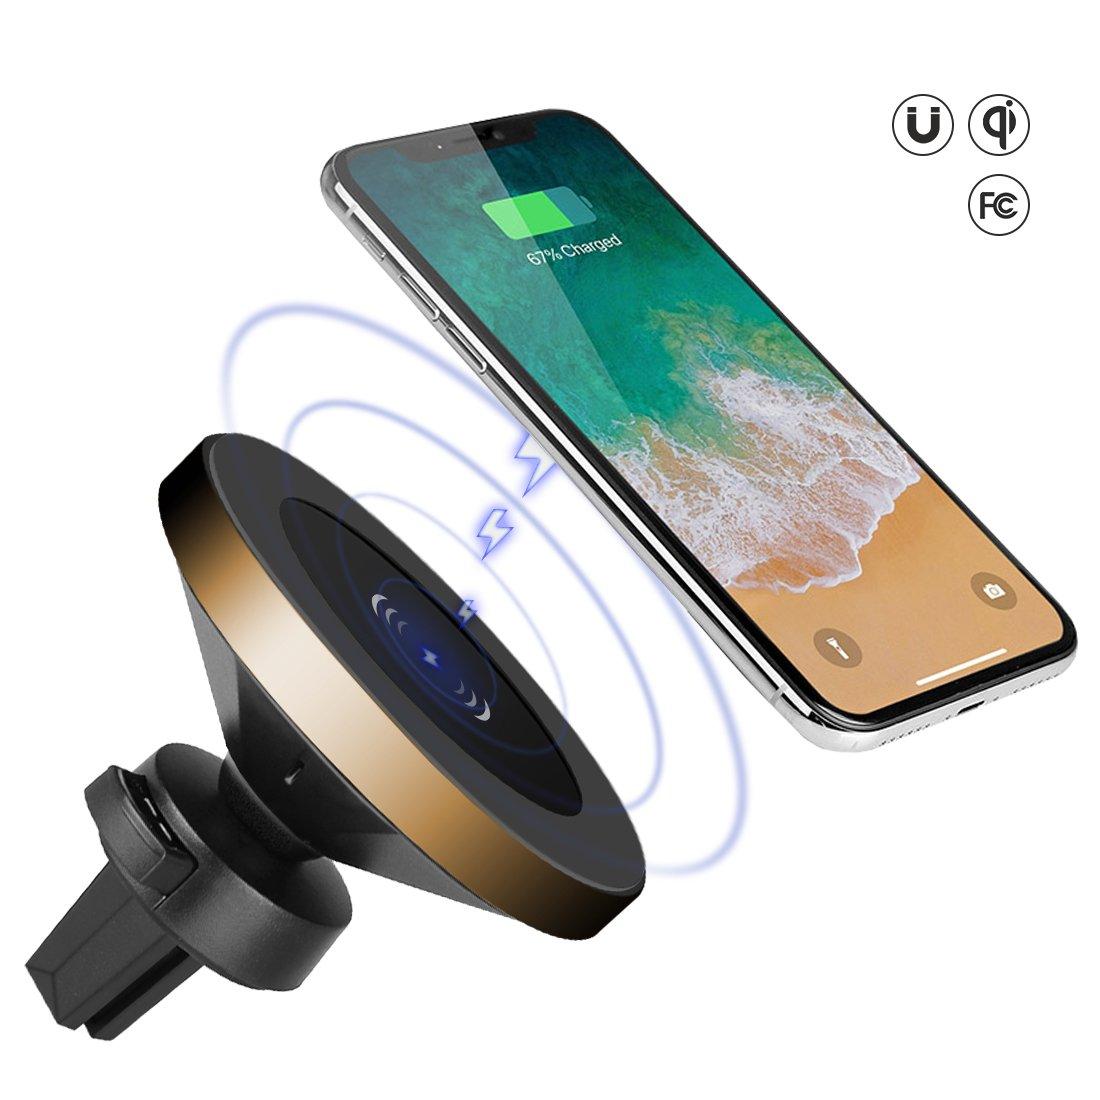 Gineeワイヤレス車充電器マウントIphone X、8,8plus ; Samsung Galaxy s8 s8 Plus、s7 Edge、s6、note8、note7、note5、車用の磁気ワイヤレス充電器、Qiデバイス B07BWG2JVF